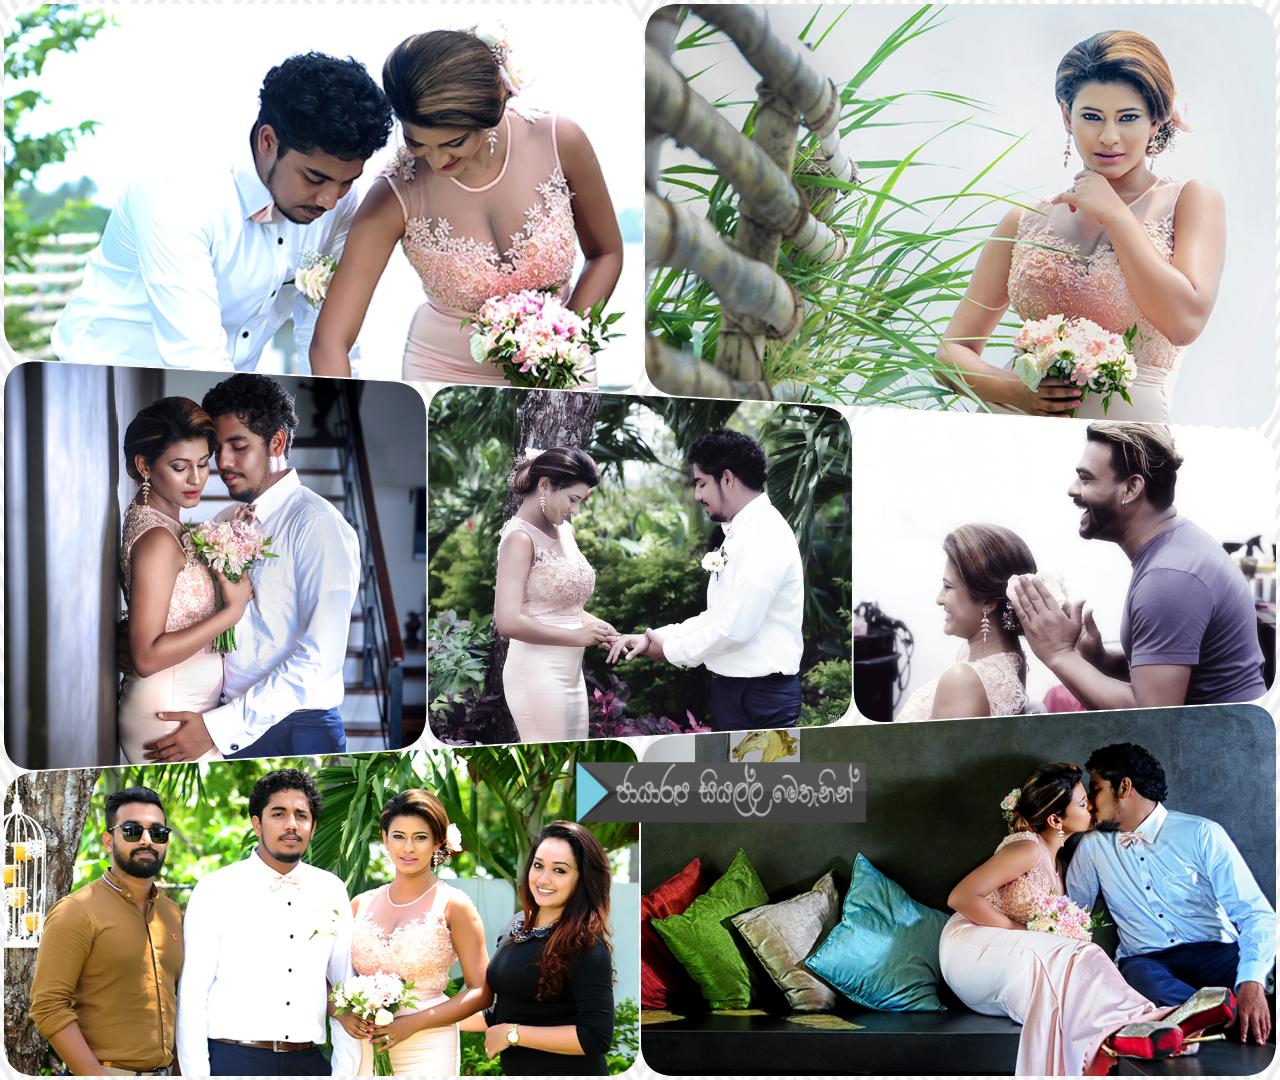 http://www.gallery.gossiplankanews.com/wedding/chamathka-lakmini-wedding-engagement.html